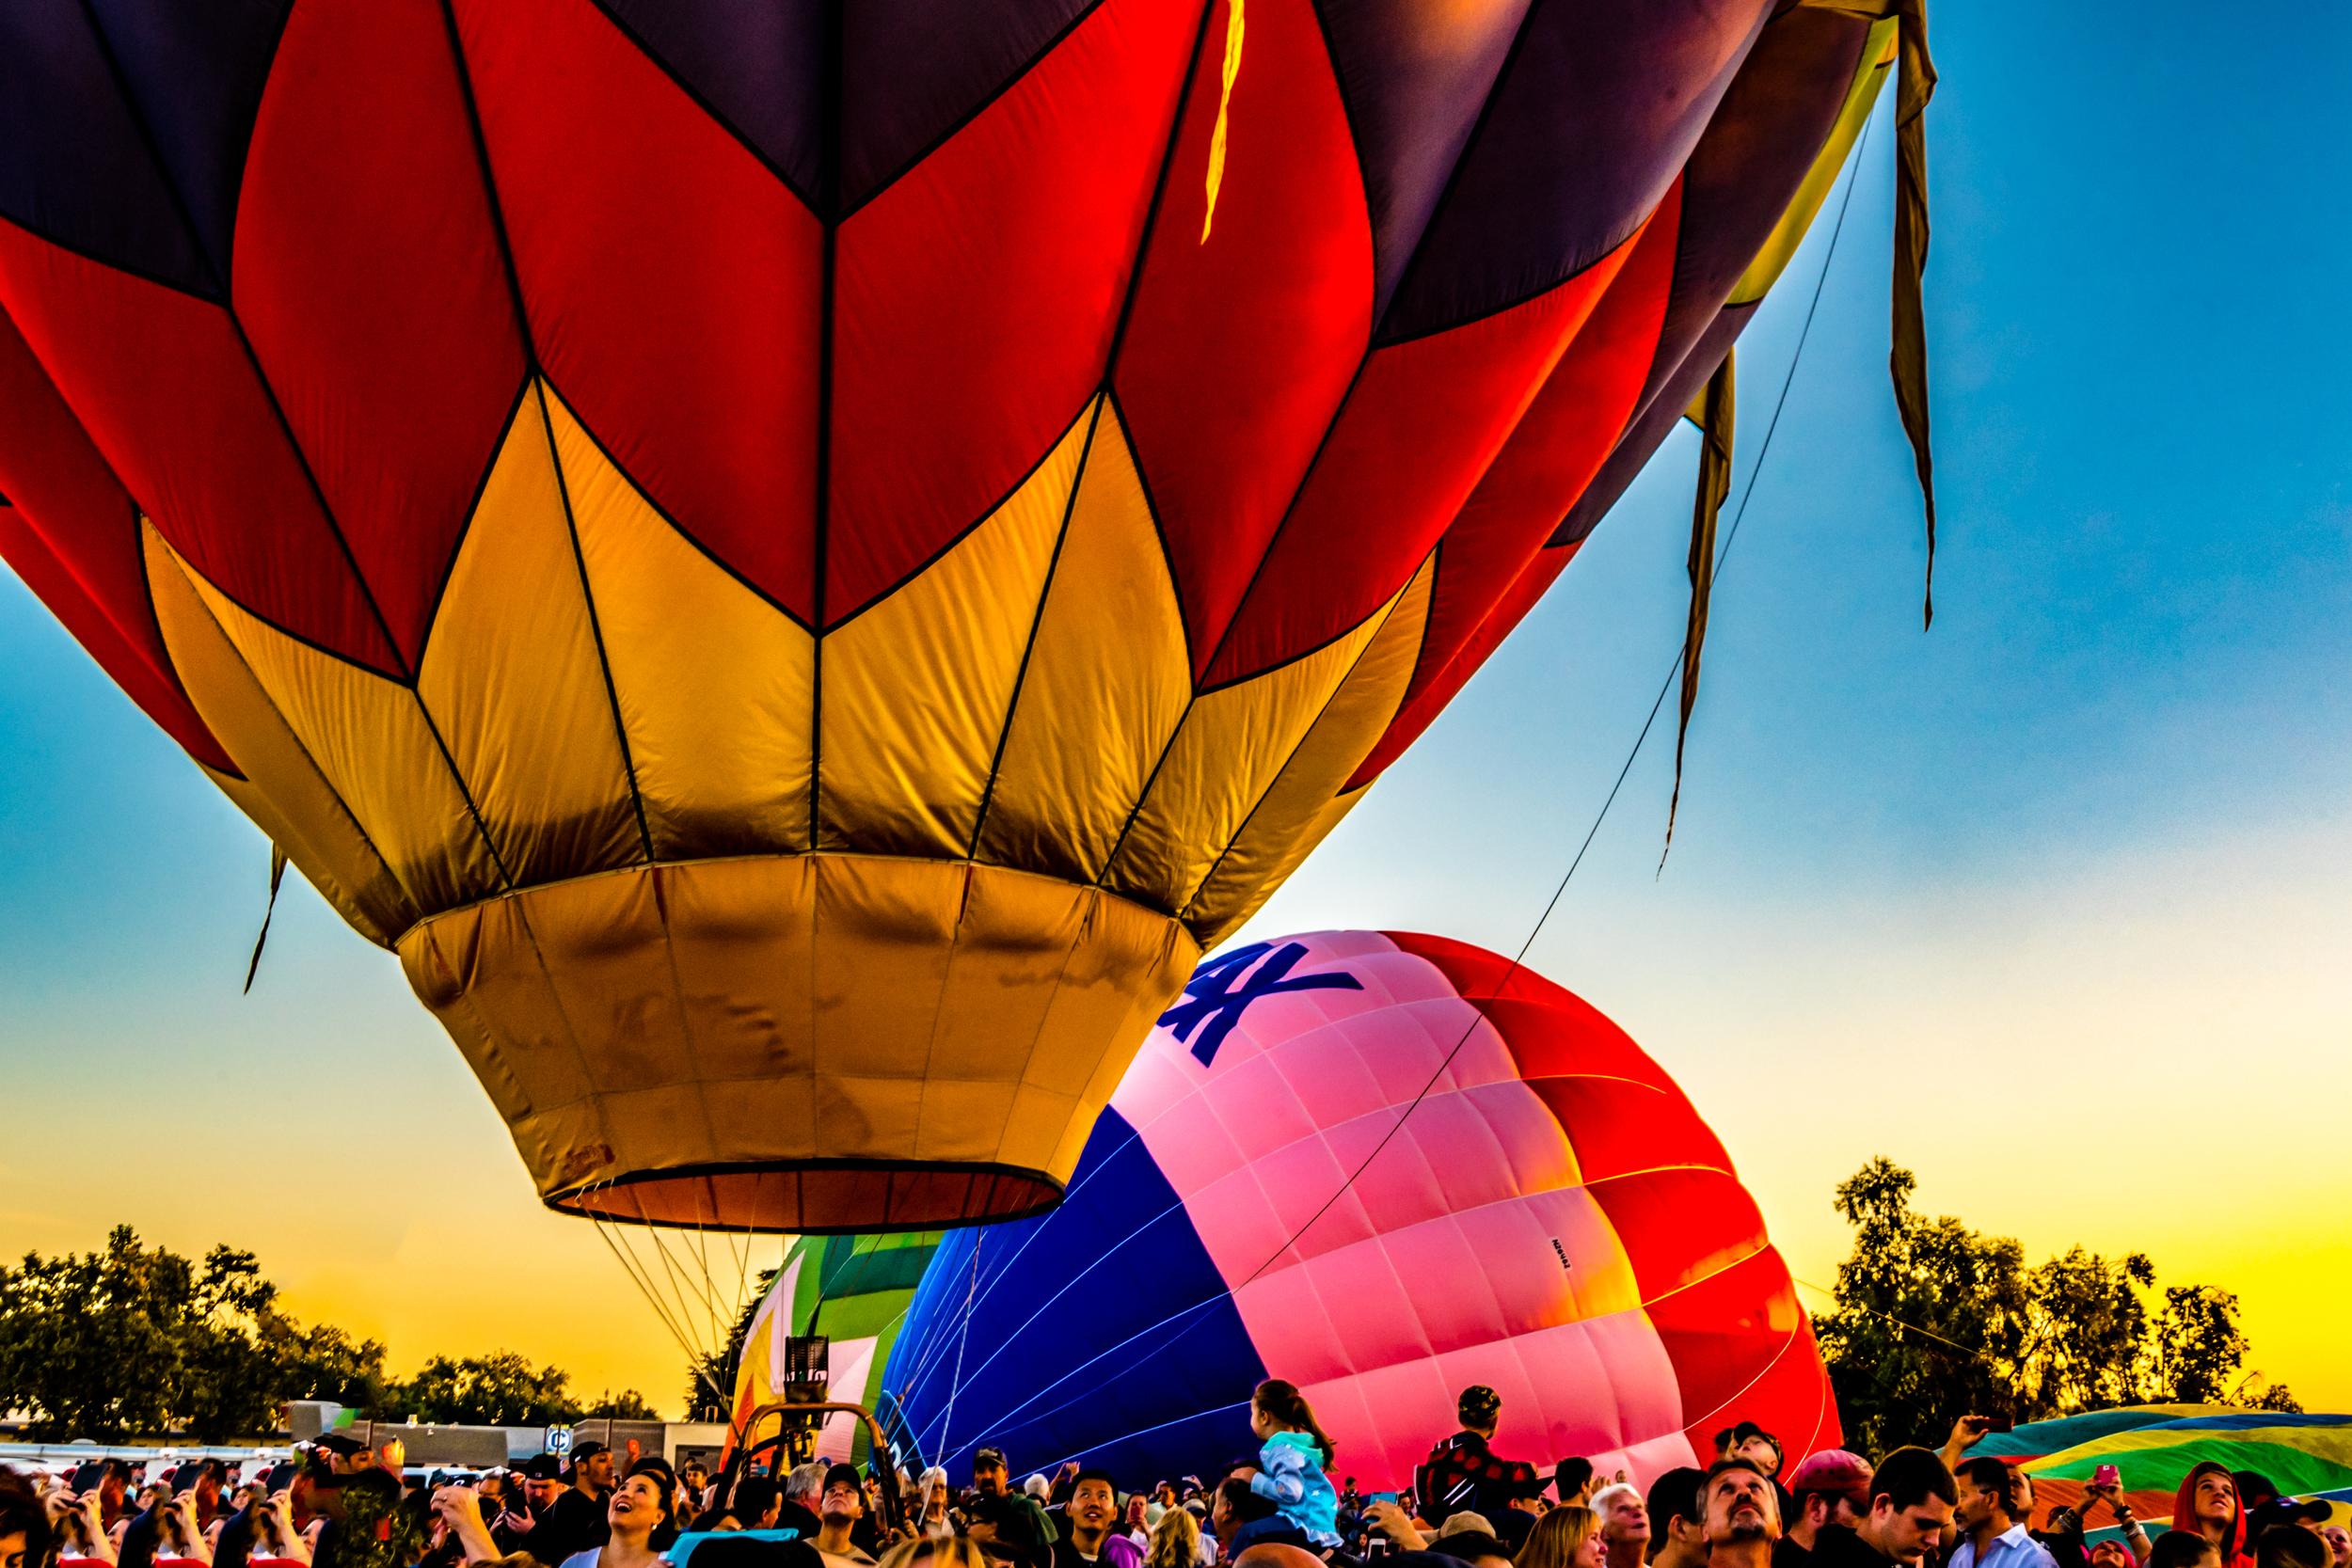 hot air balloons-4.jpg